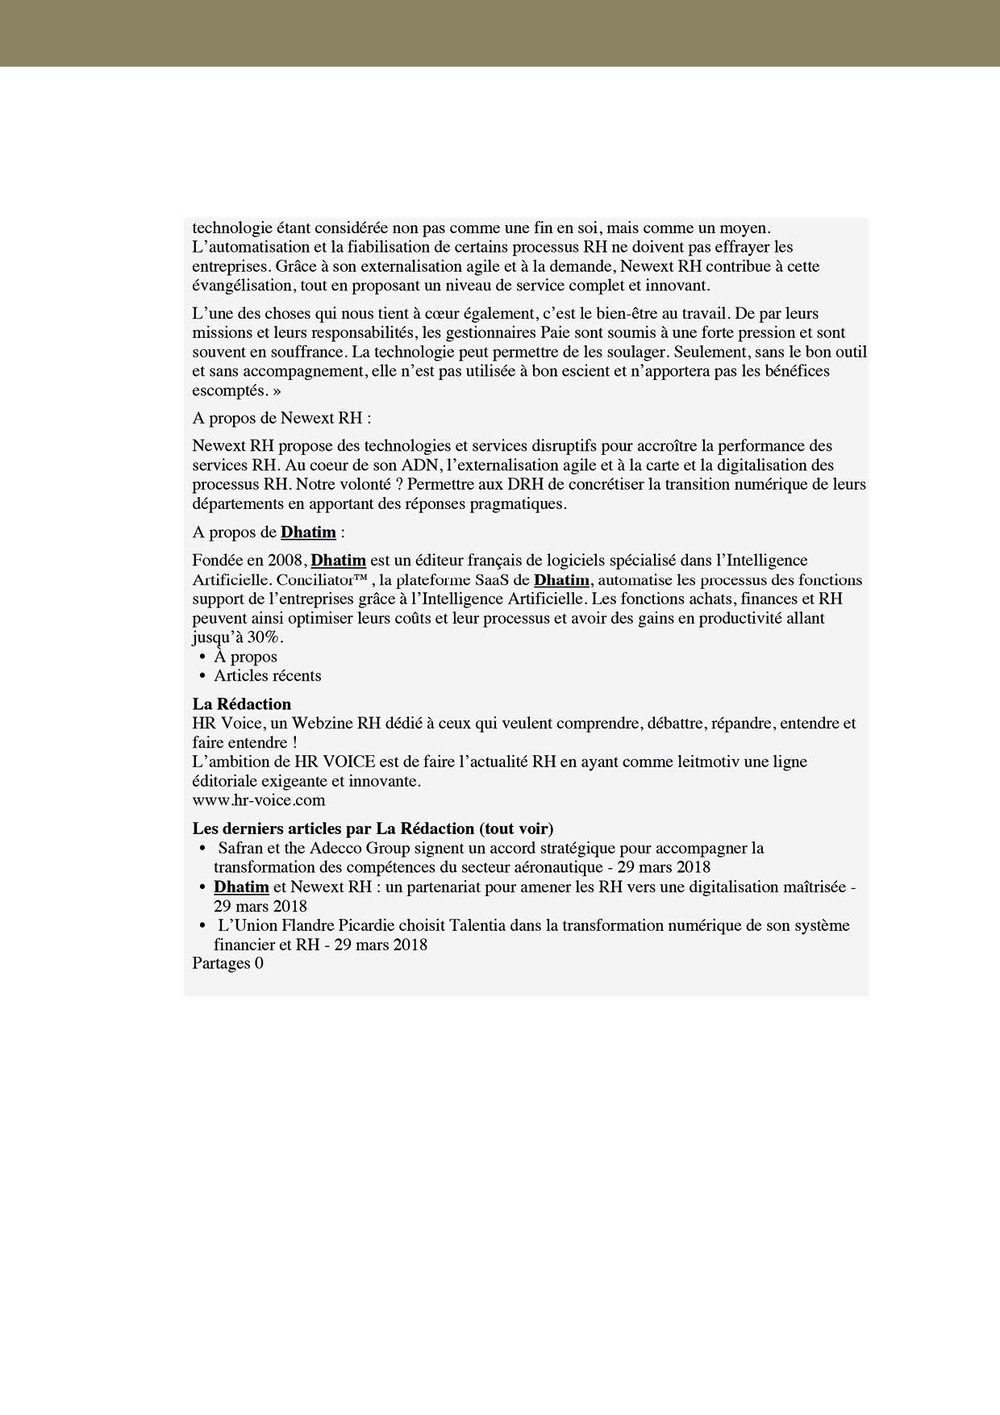 BOOKMEDIA_MAR50.jpg